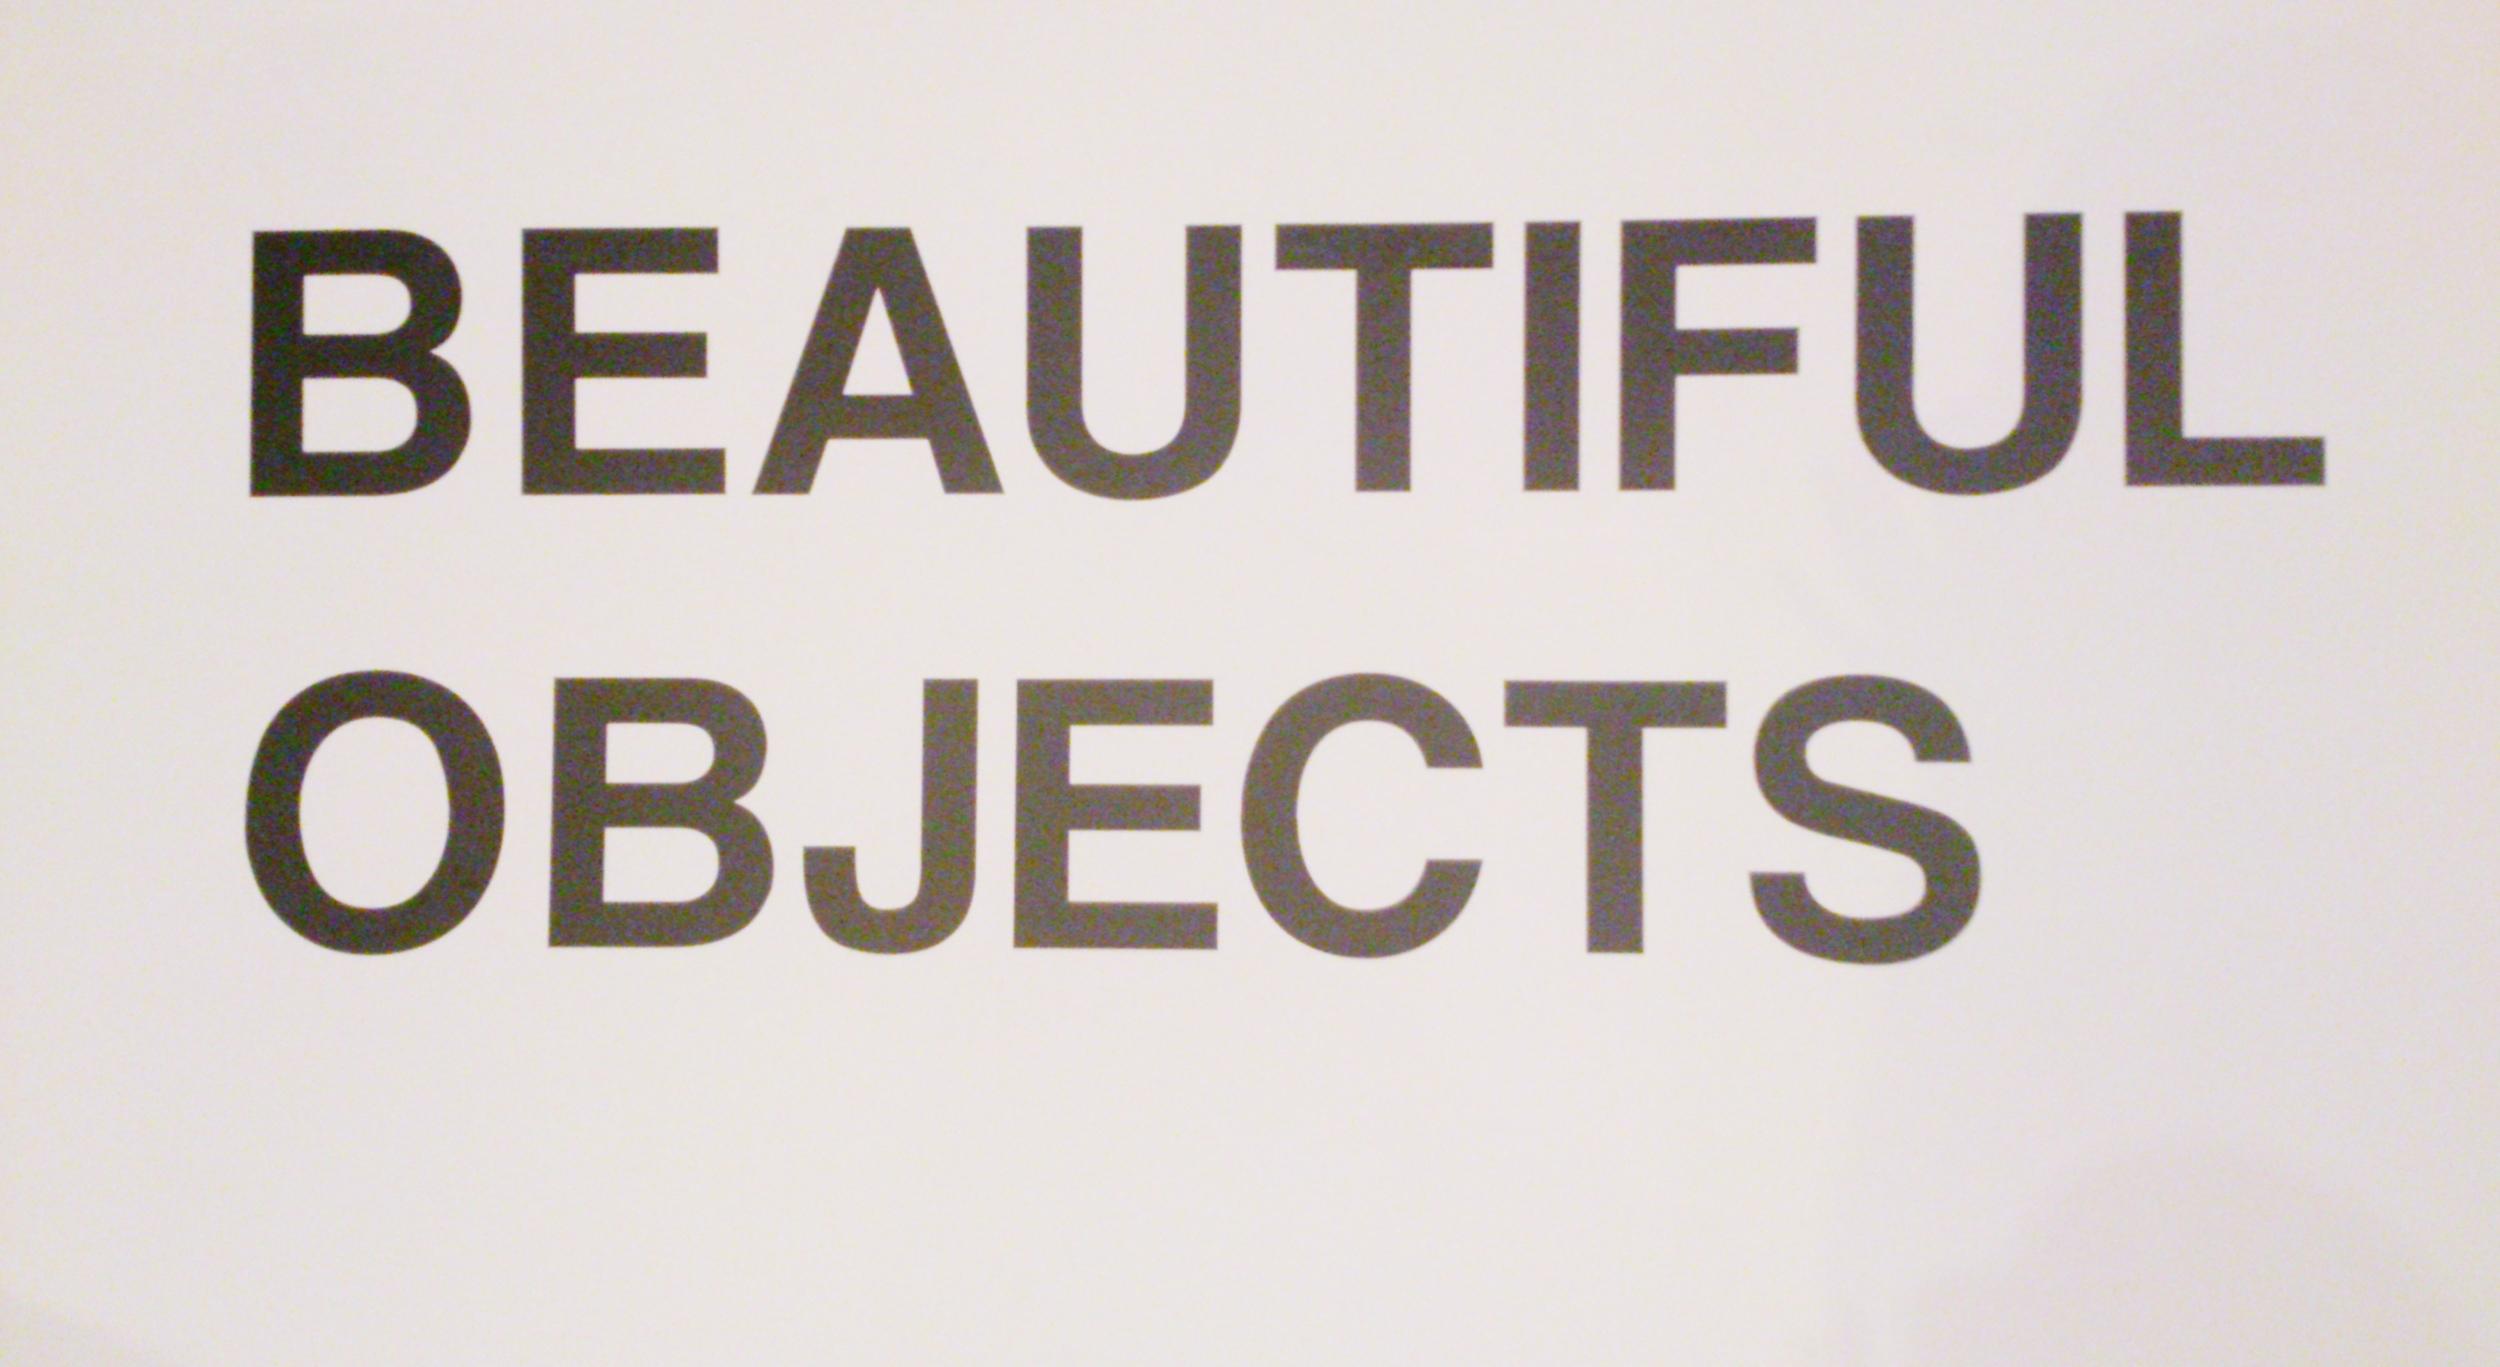 beautiful objects aram sign.jpg